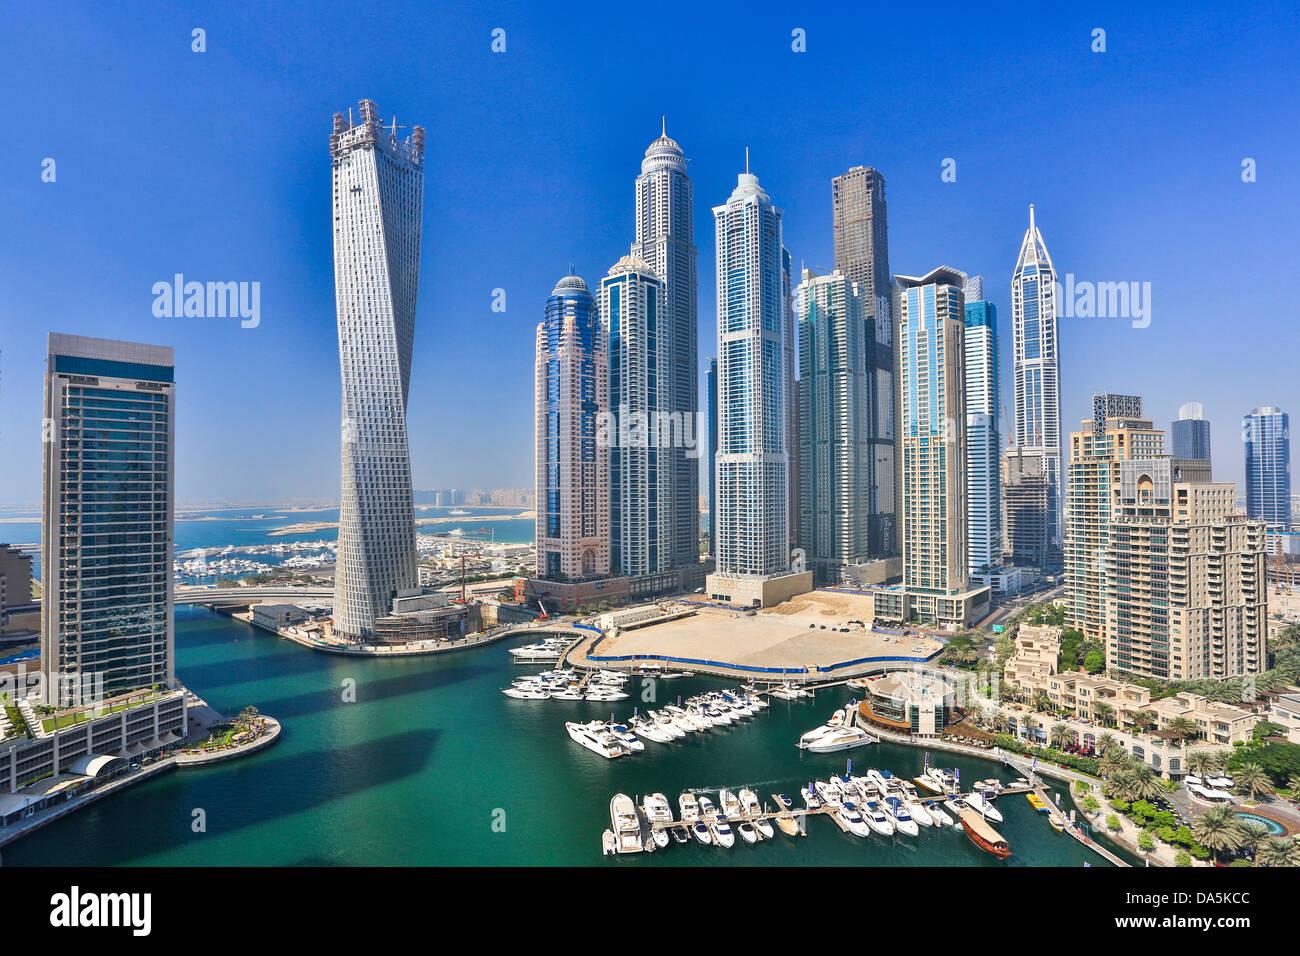 United Arab Emirates, UAE, Dubai, City, Dubai Marina, Infinity, Building, architecture, boat, boats, buildings, - Stock Image